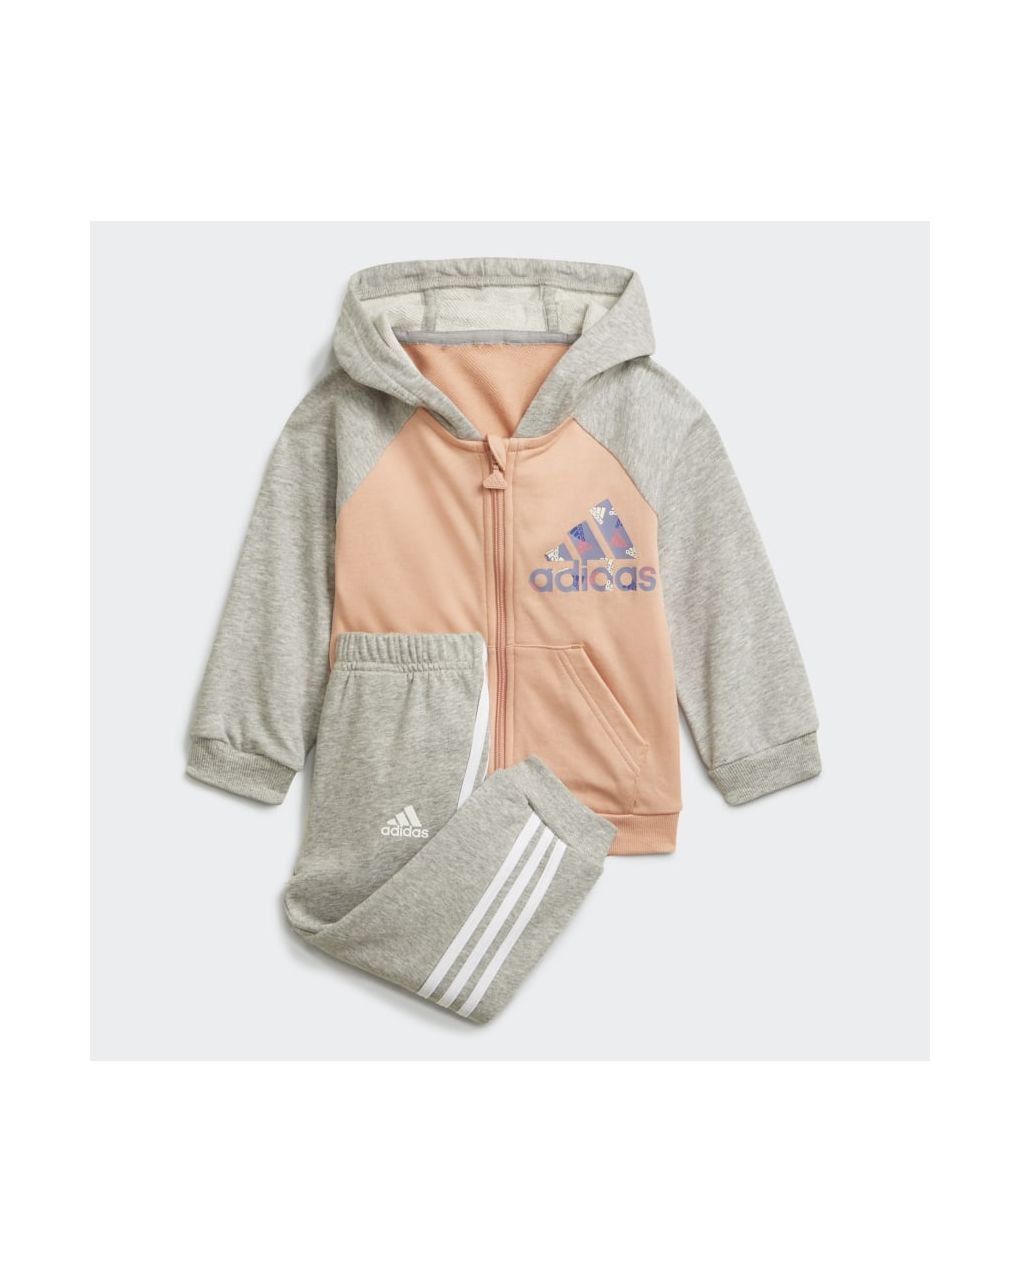 Adidas Σετ Φόρμας Badge of Sport Full Γκρι/Ροζ για Κορίτσι H28831